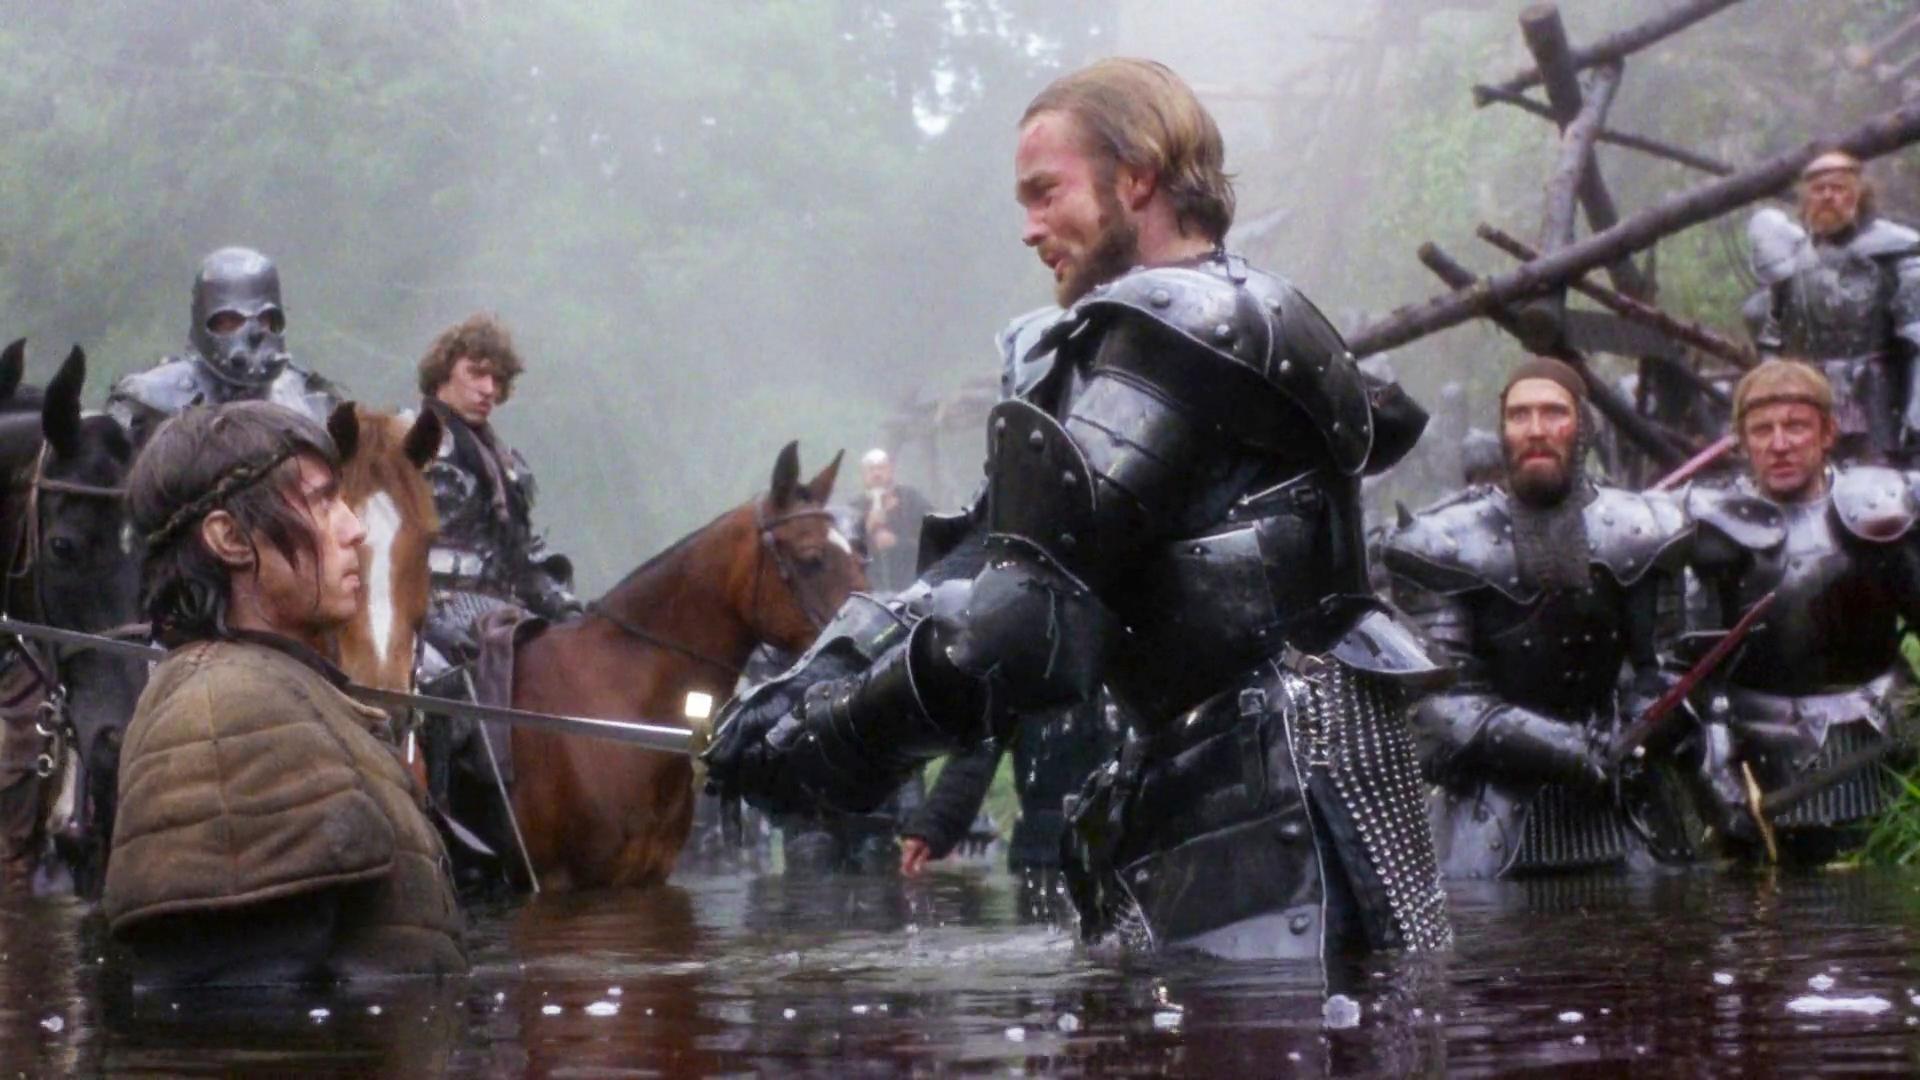 Scéna ze snímku Excalibur z roku 1981. (Orion Pictures)